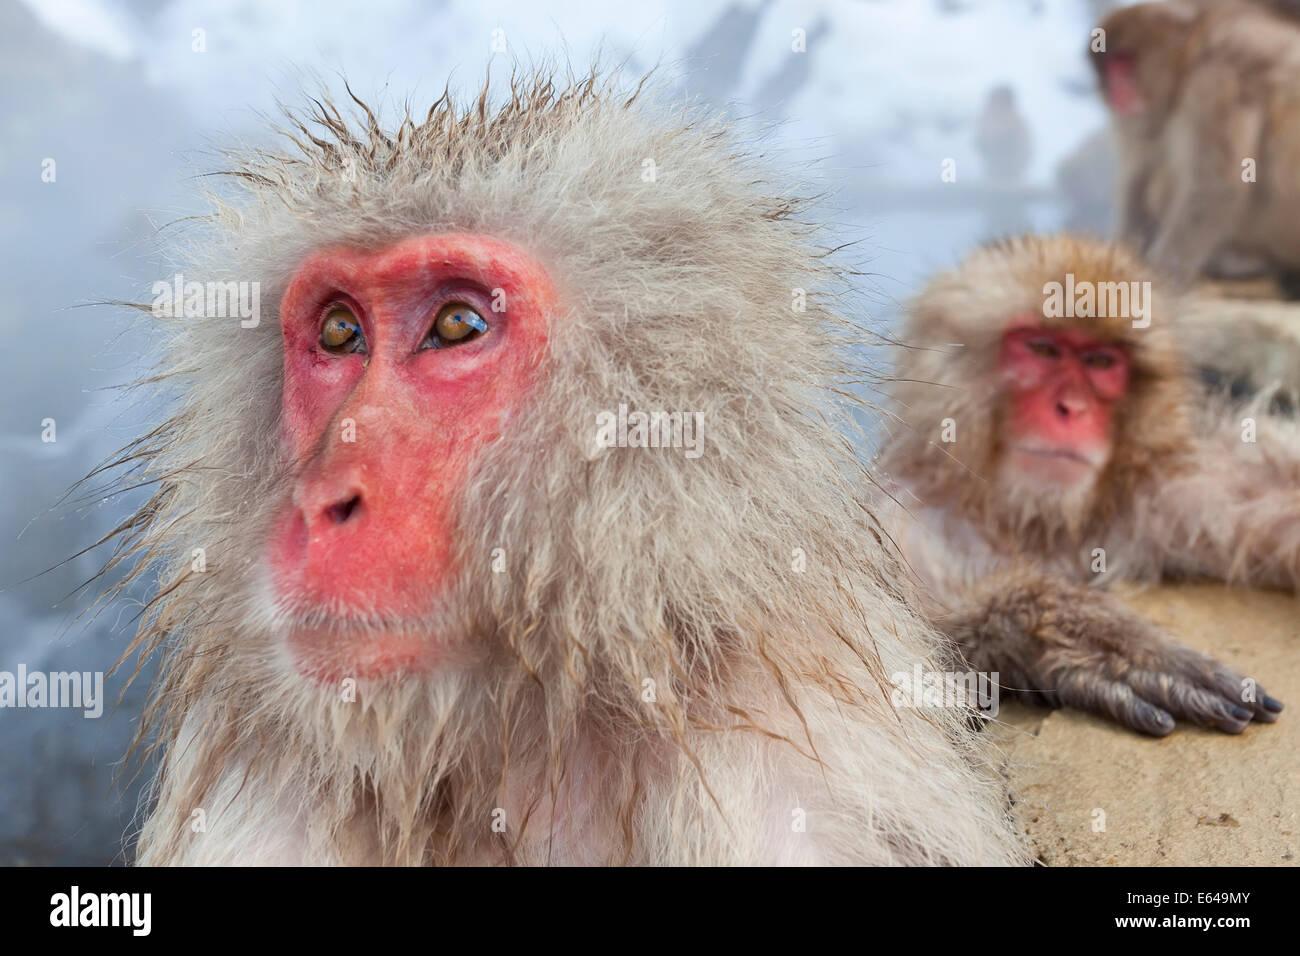 Japanischen Makaken (Macaca Fuscata) / Snow Monkey, Joshin-Etsu Nationalpark, Honshu, Japan Stockfoto